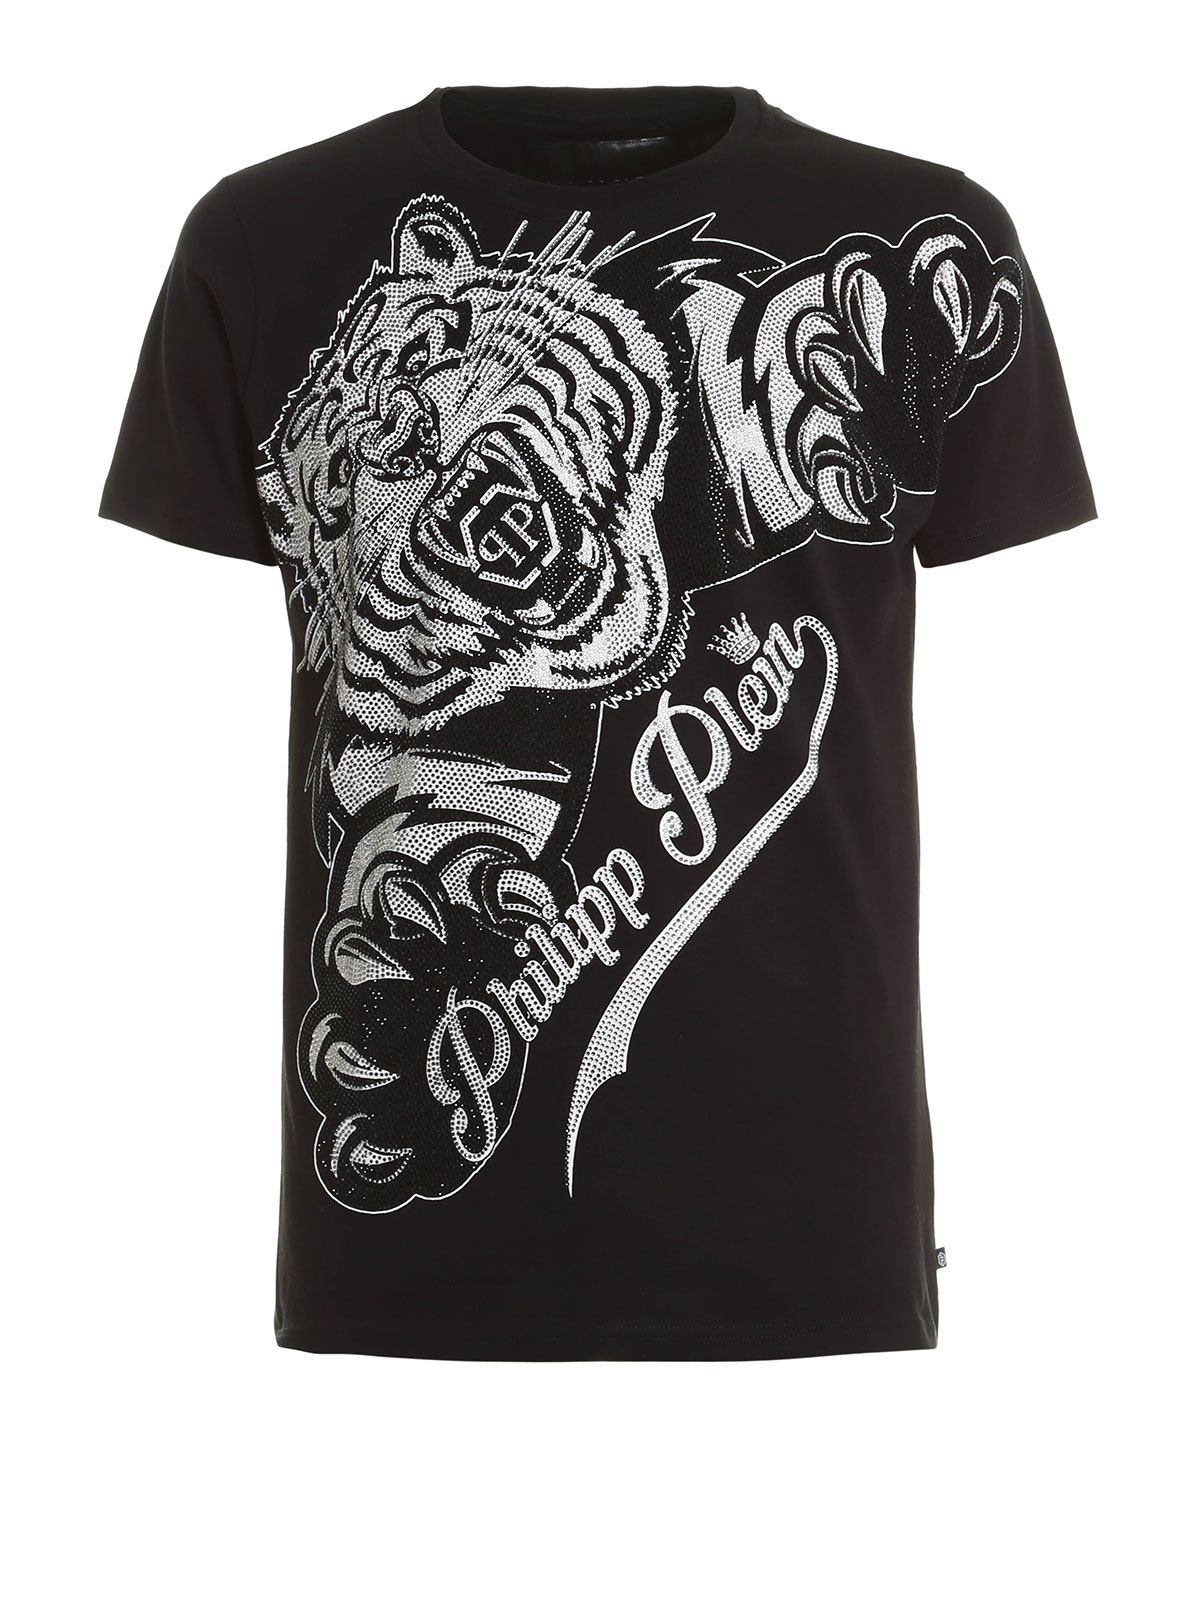 philipp plein claws embellished t shirt t shirts. Black Bedroom Furniture Sets. Home Design Ideas